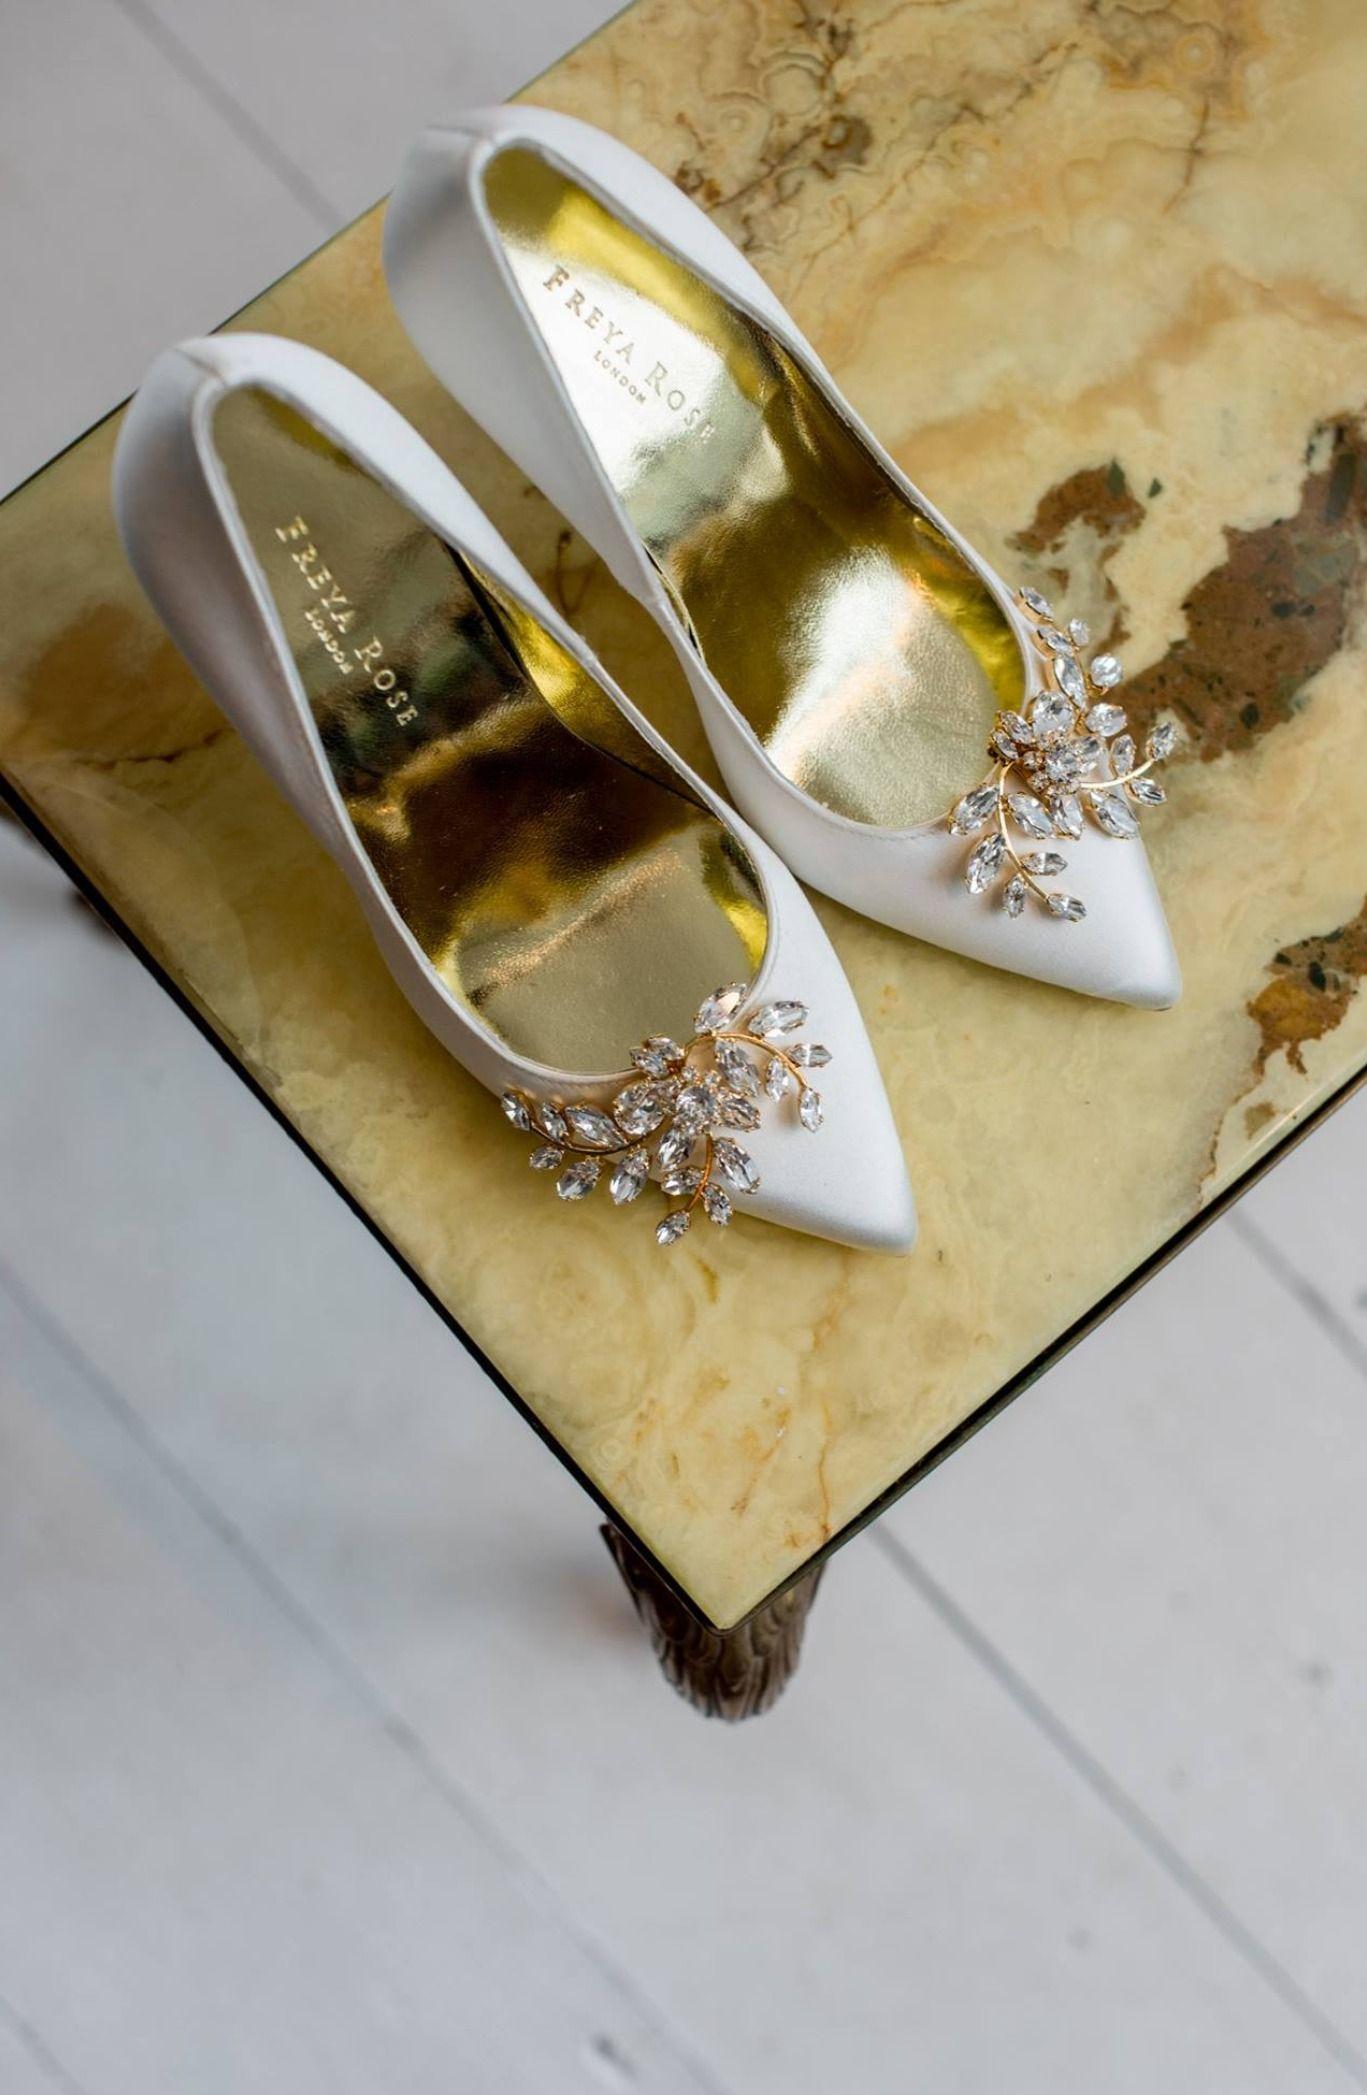 Freya Rose Haywood Gold Swarovski Crystal Embellished Shoe Clips - £195